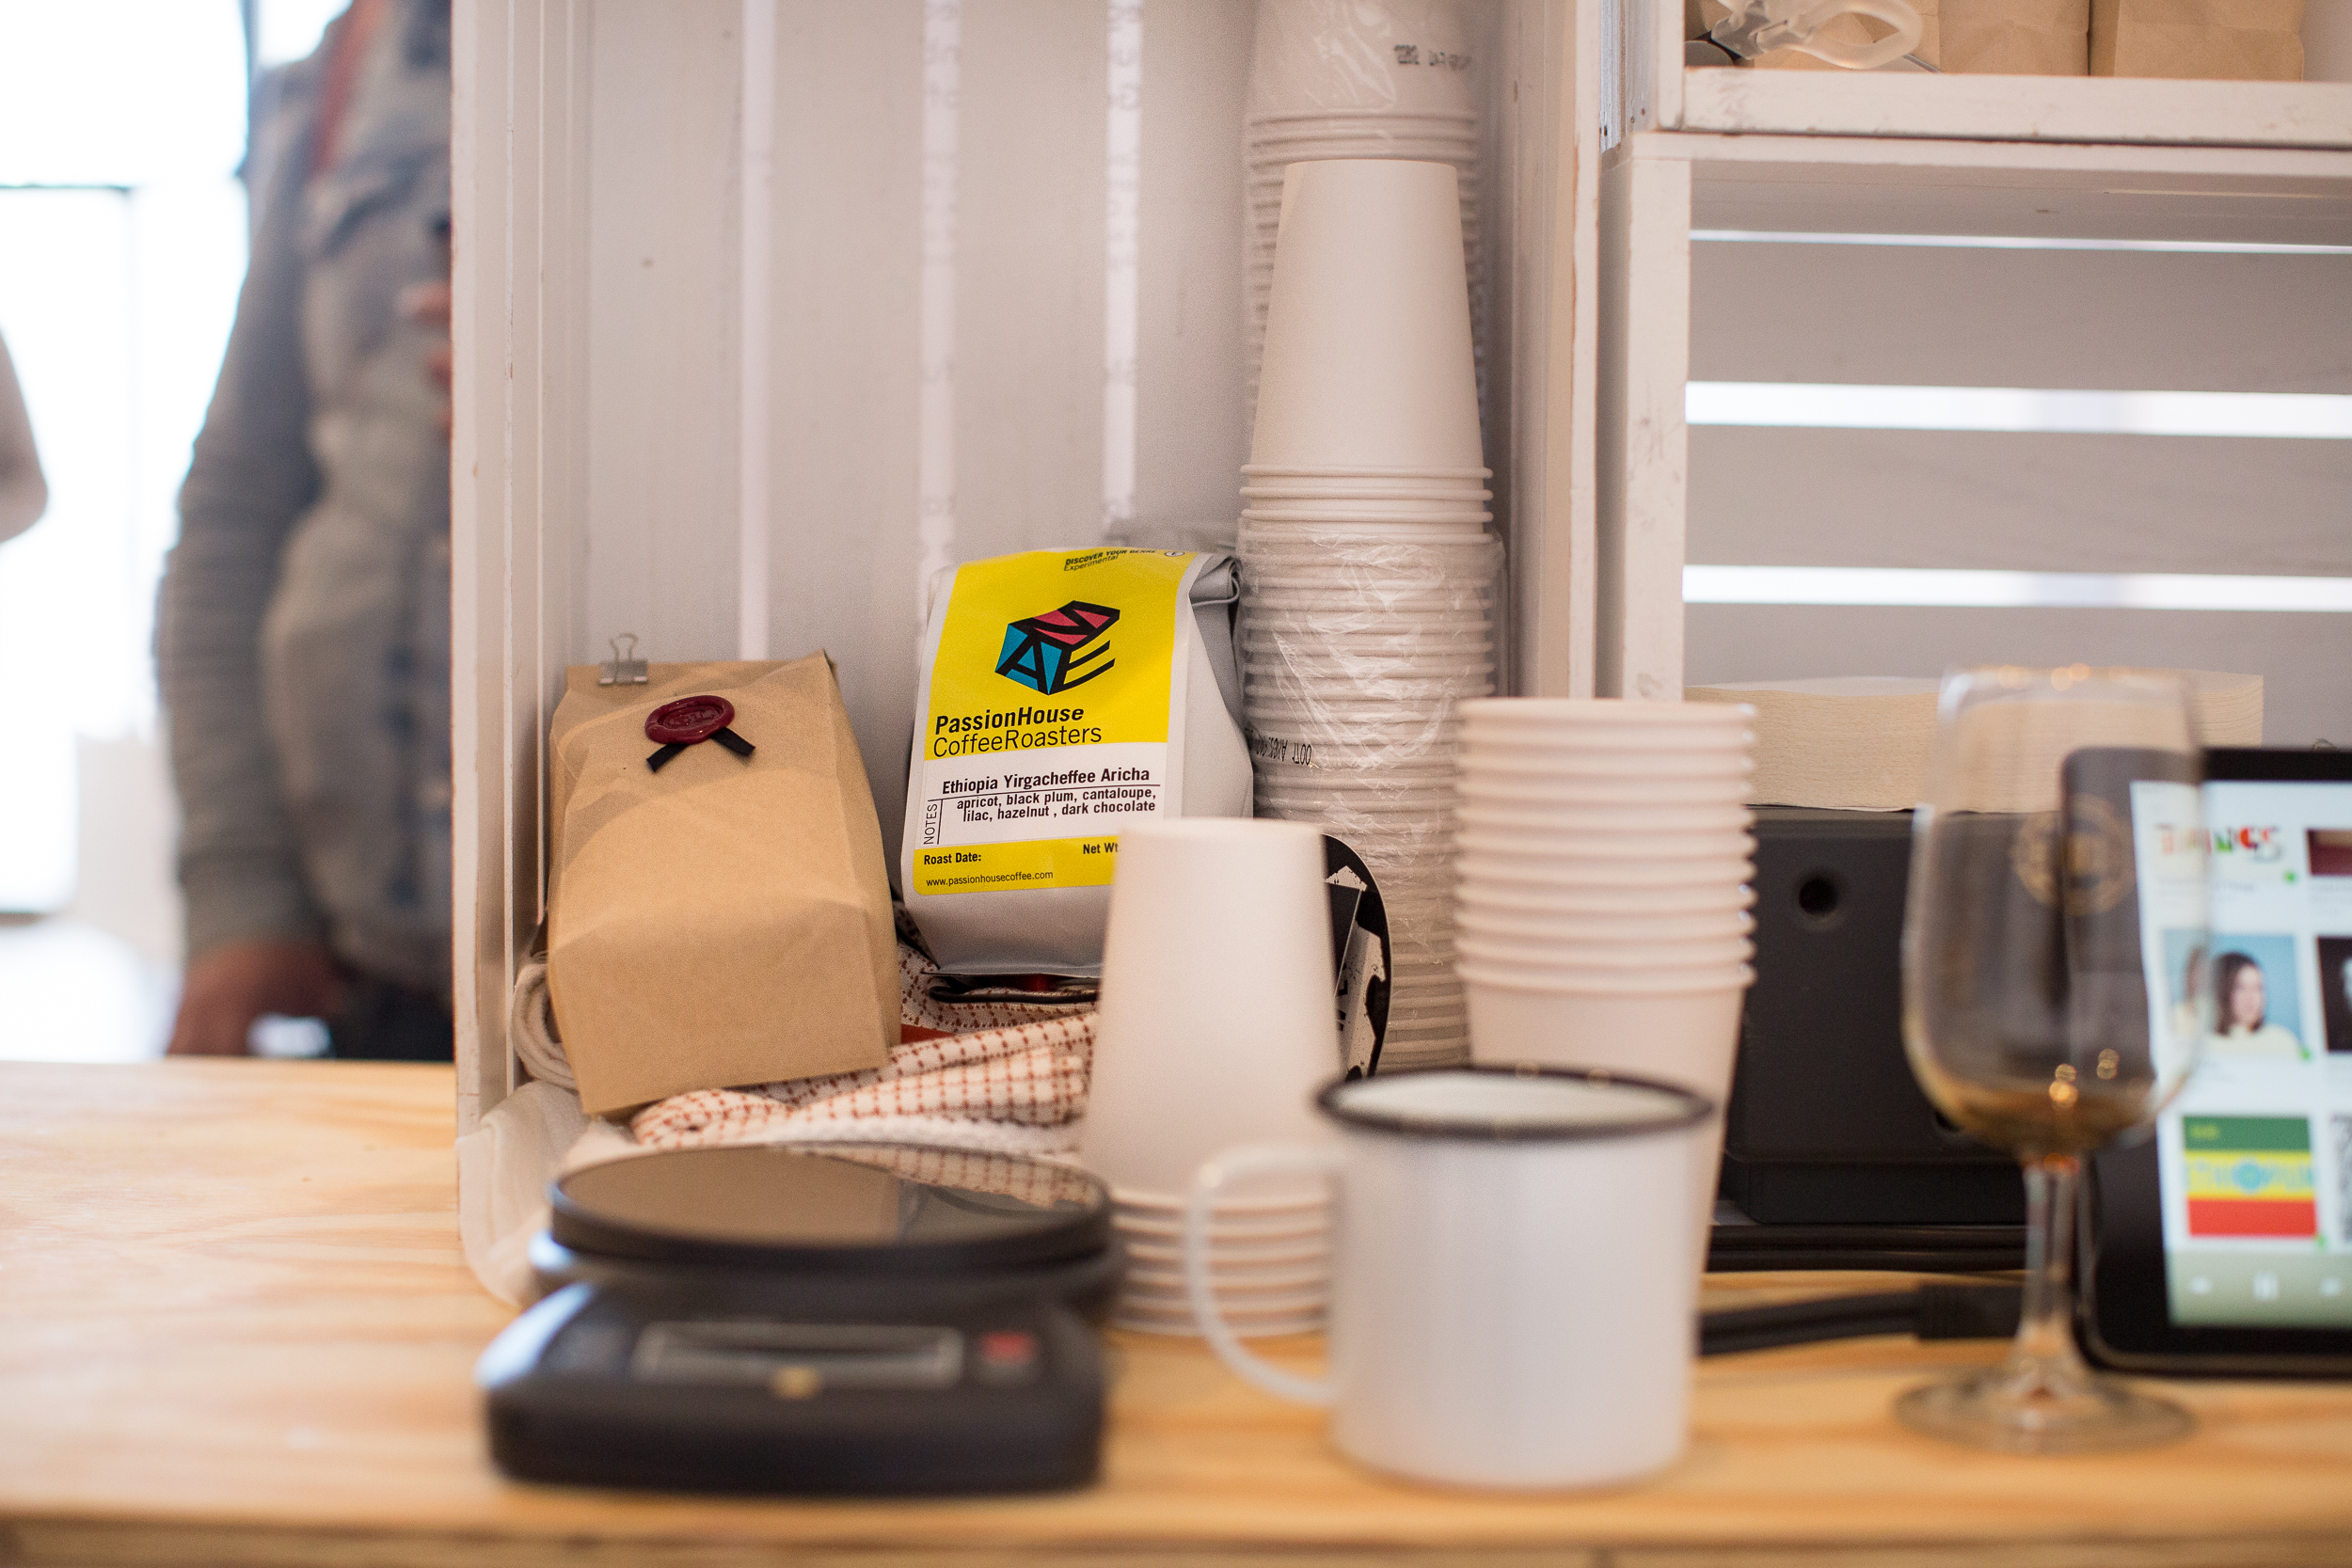 Gaslight Coffee, Passion House Coffee